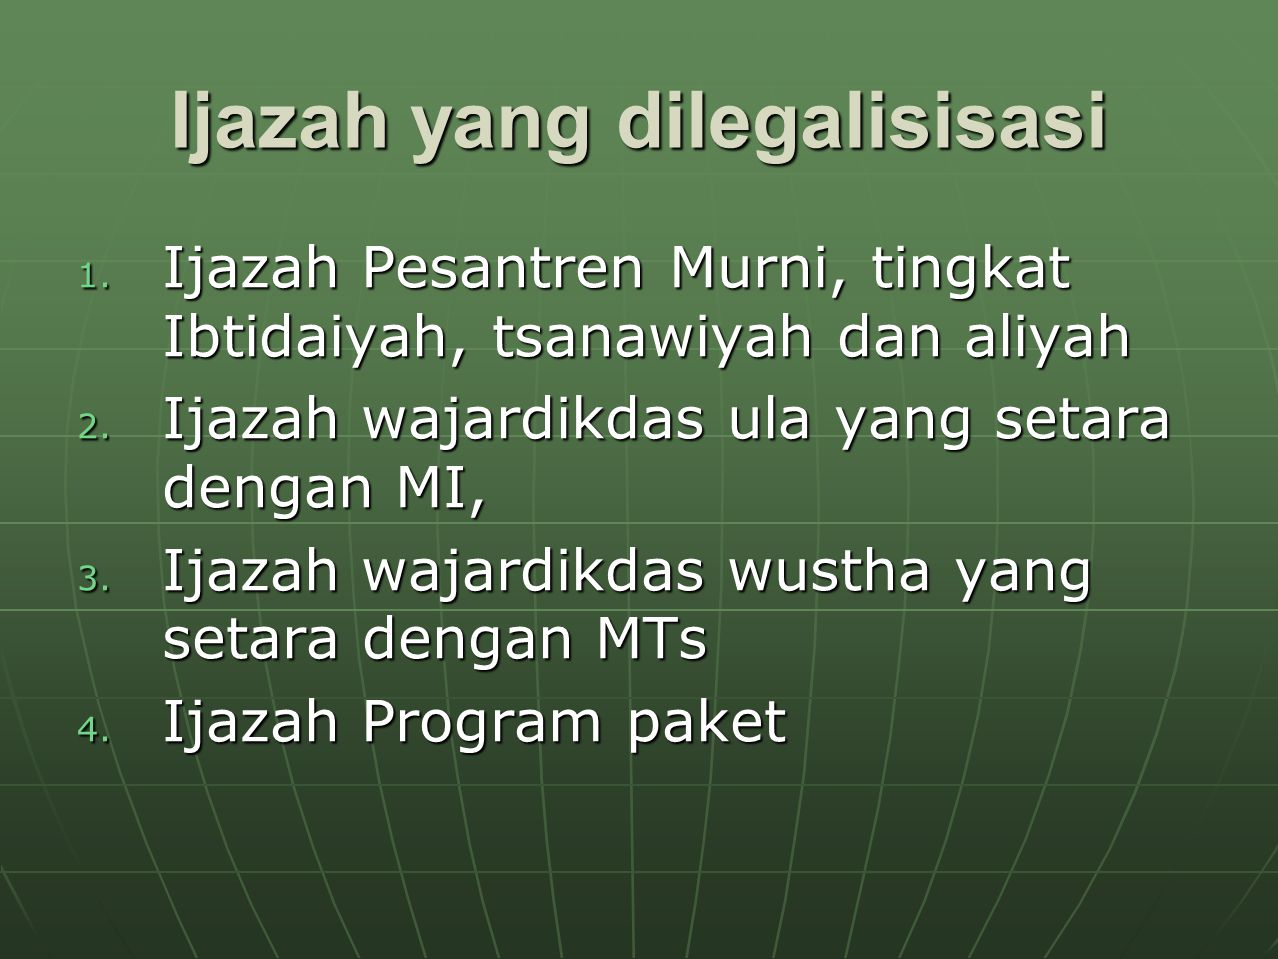 Ijazah yang dilegalisisasi 1. Ijazah Pesantren Murni, tingkat Ibtidaiyah, tsanawiyah dan aliyah 2. Ijazah wajardikdas ula yang setara dengan MI, 3. Ij